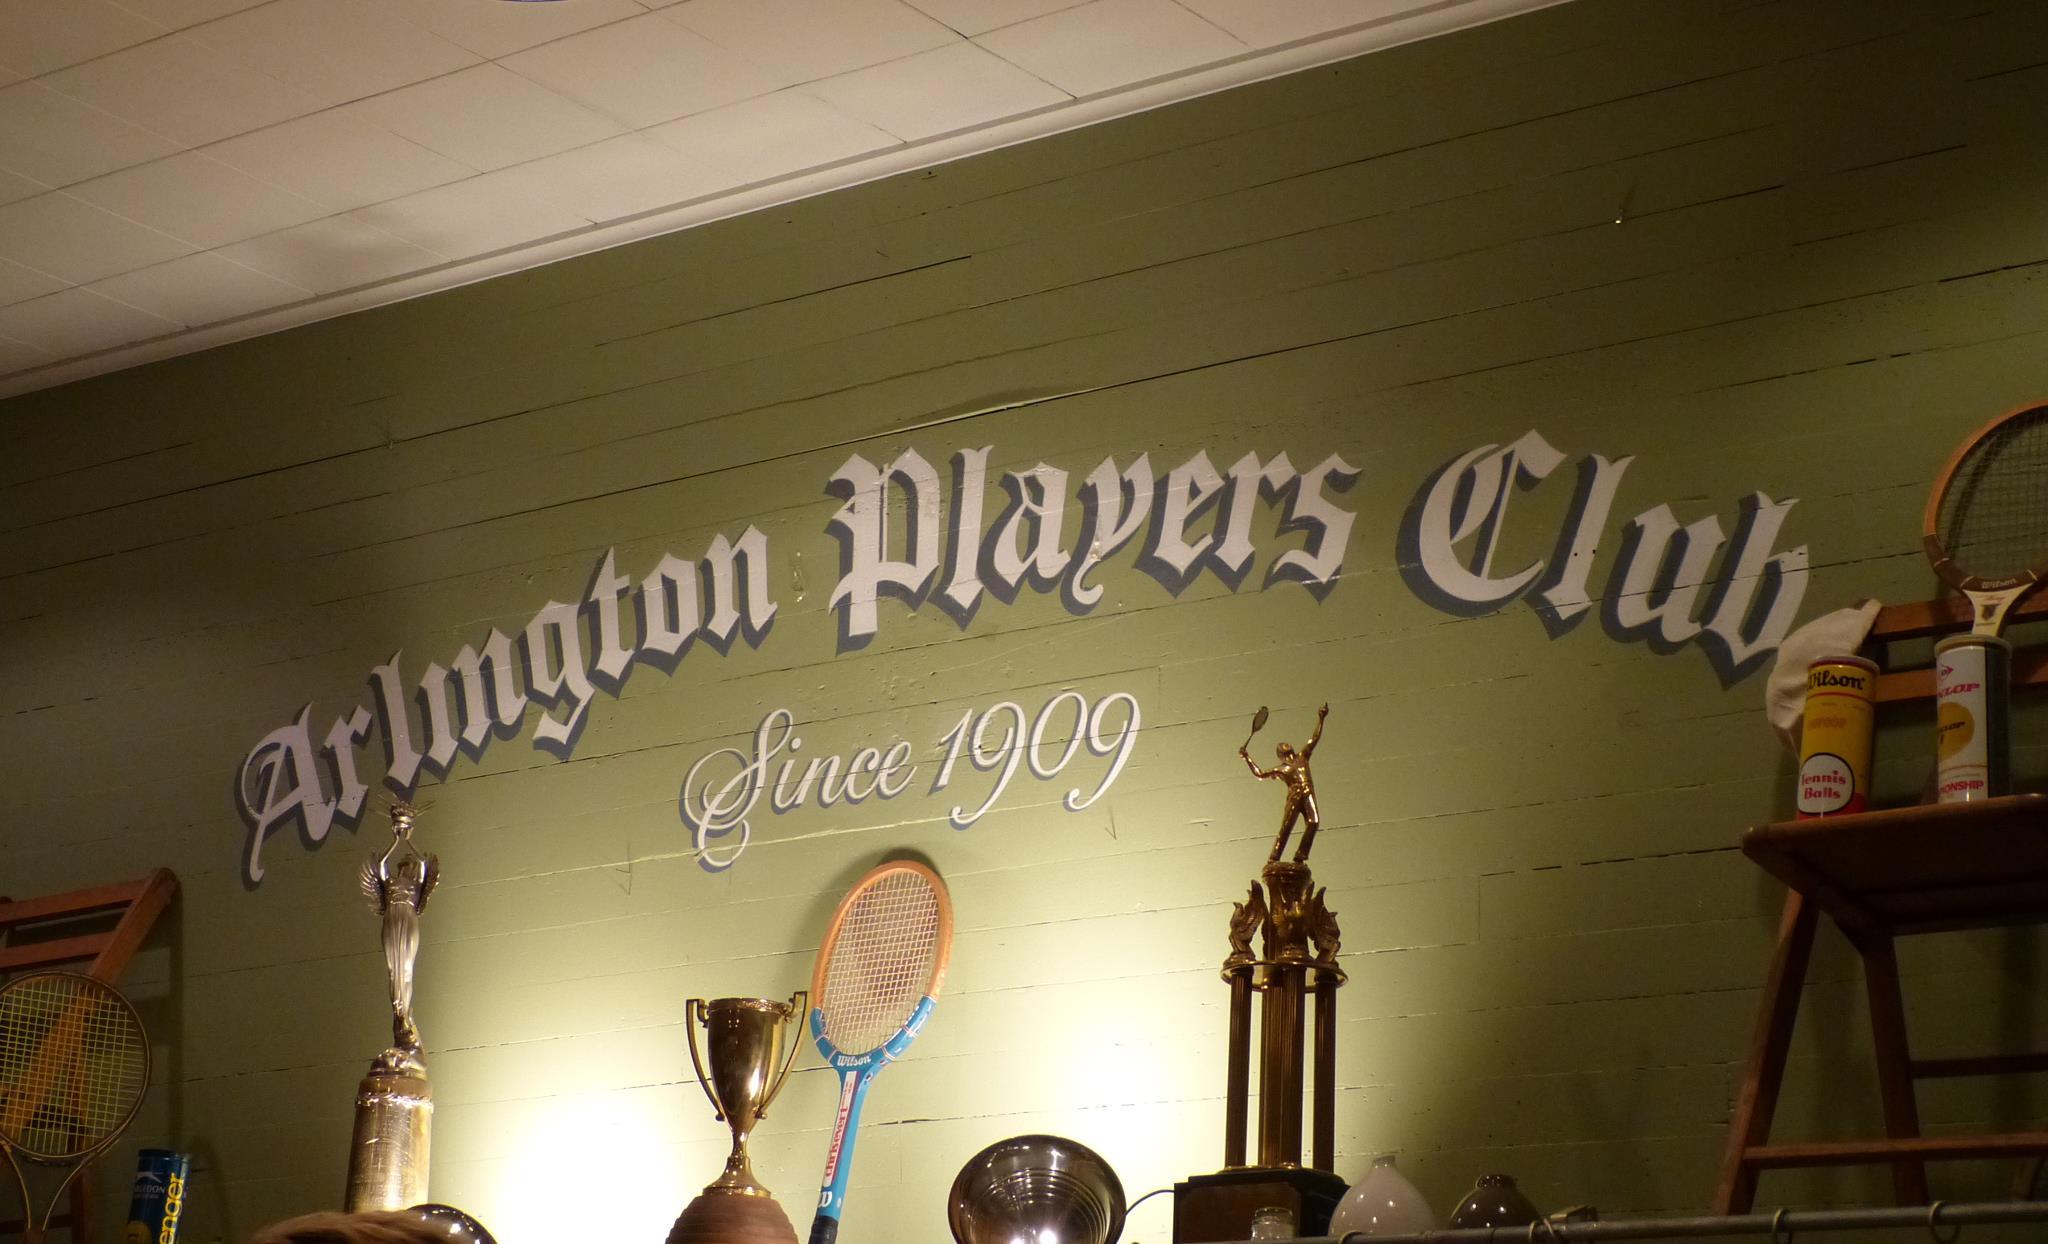 APC Tennis Club was established in 1909.